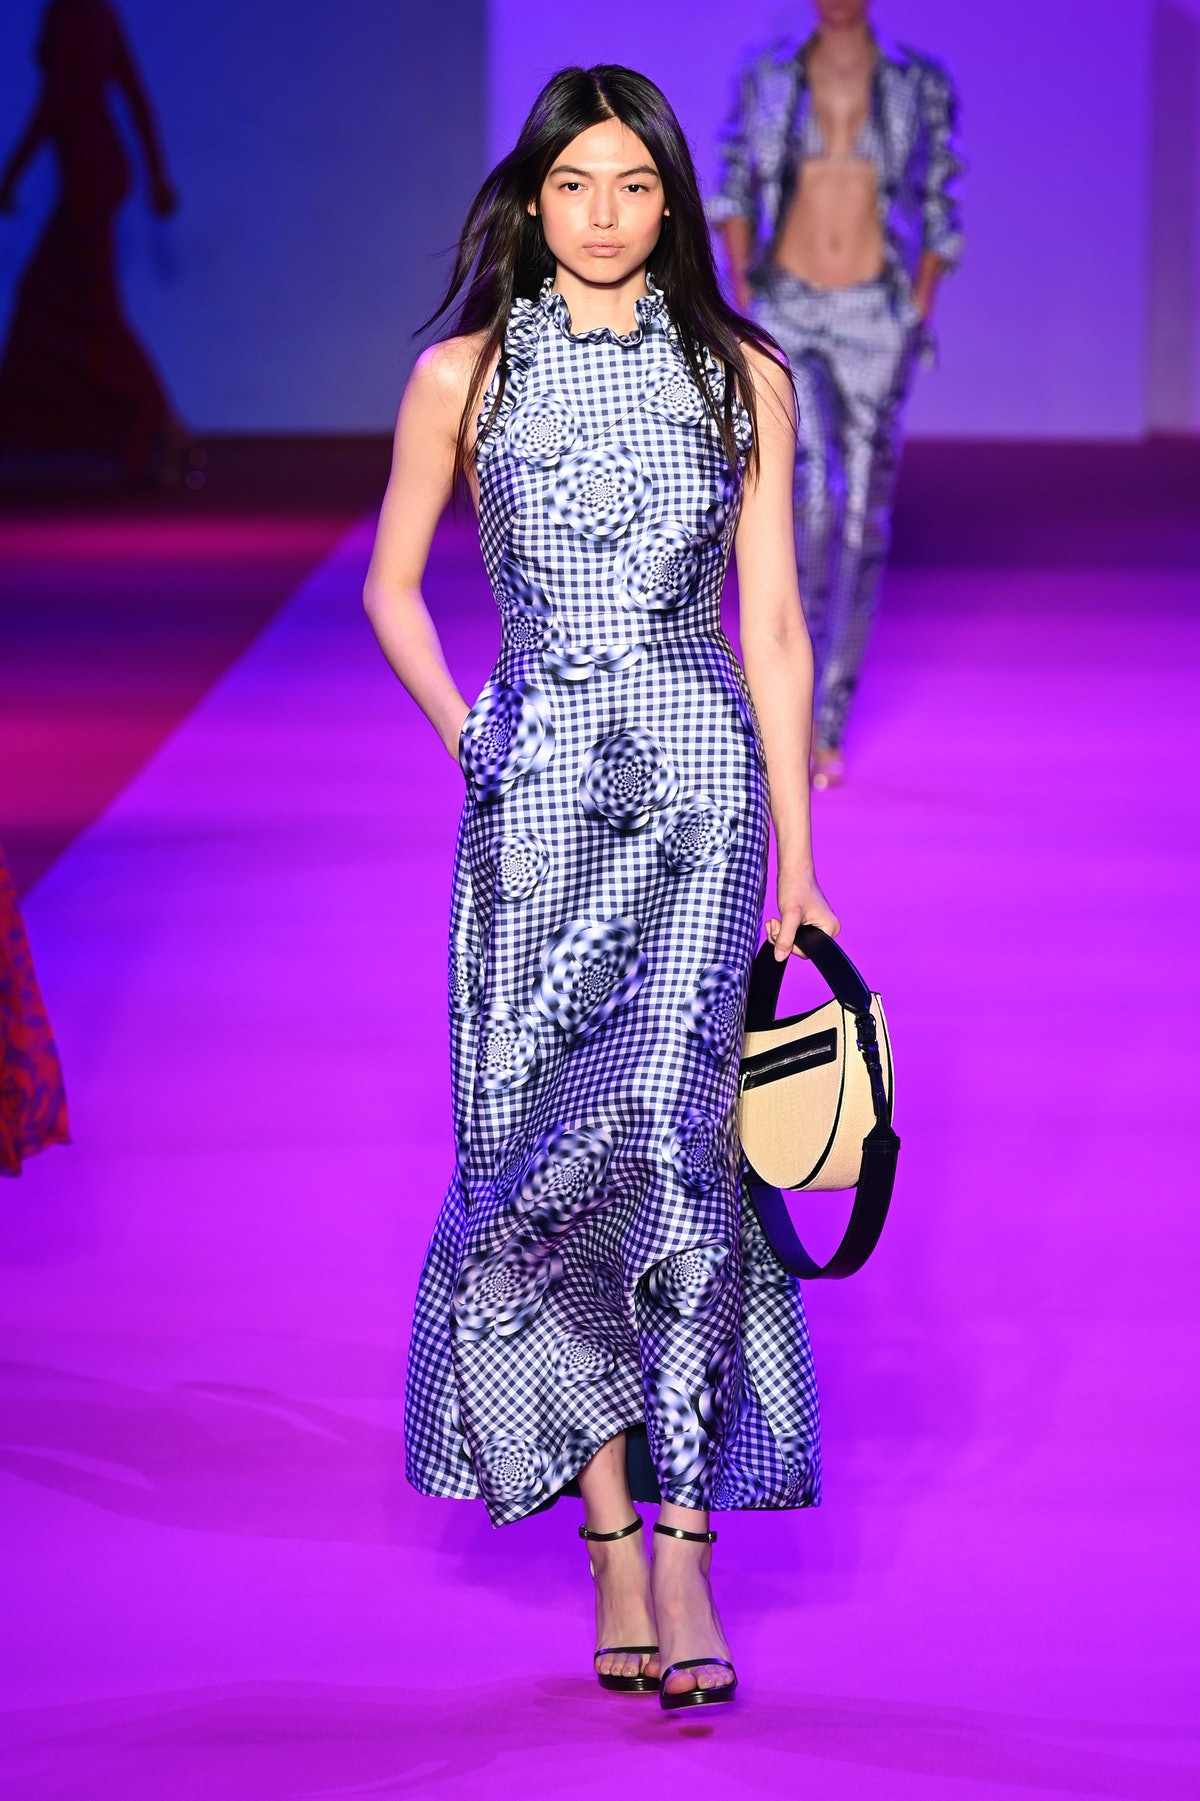 NEW YORK, NEW YORK - SEPTEMBER 10: A model walks the runway for Brandon Maxwell during NYFW: The Sho...